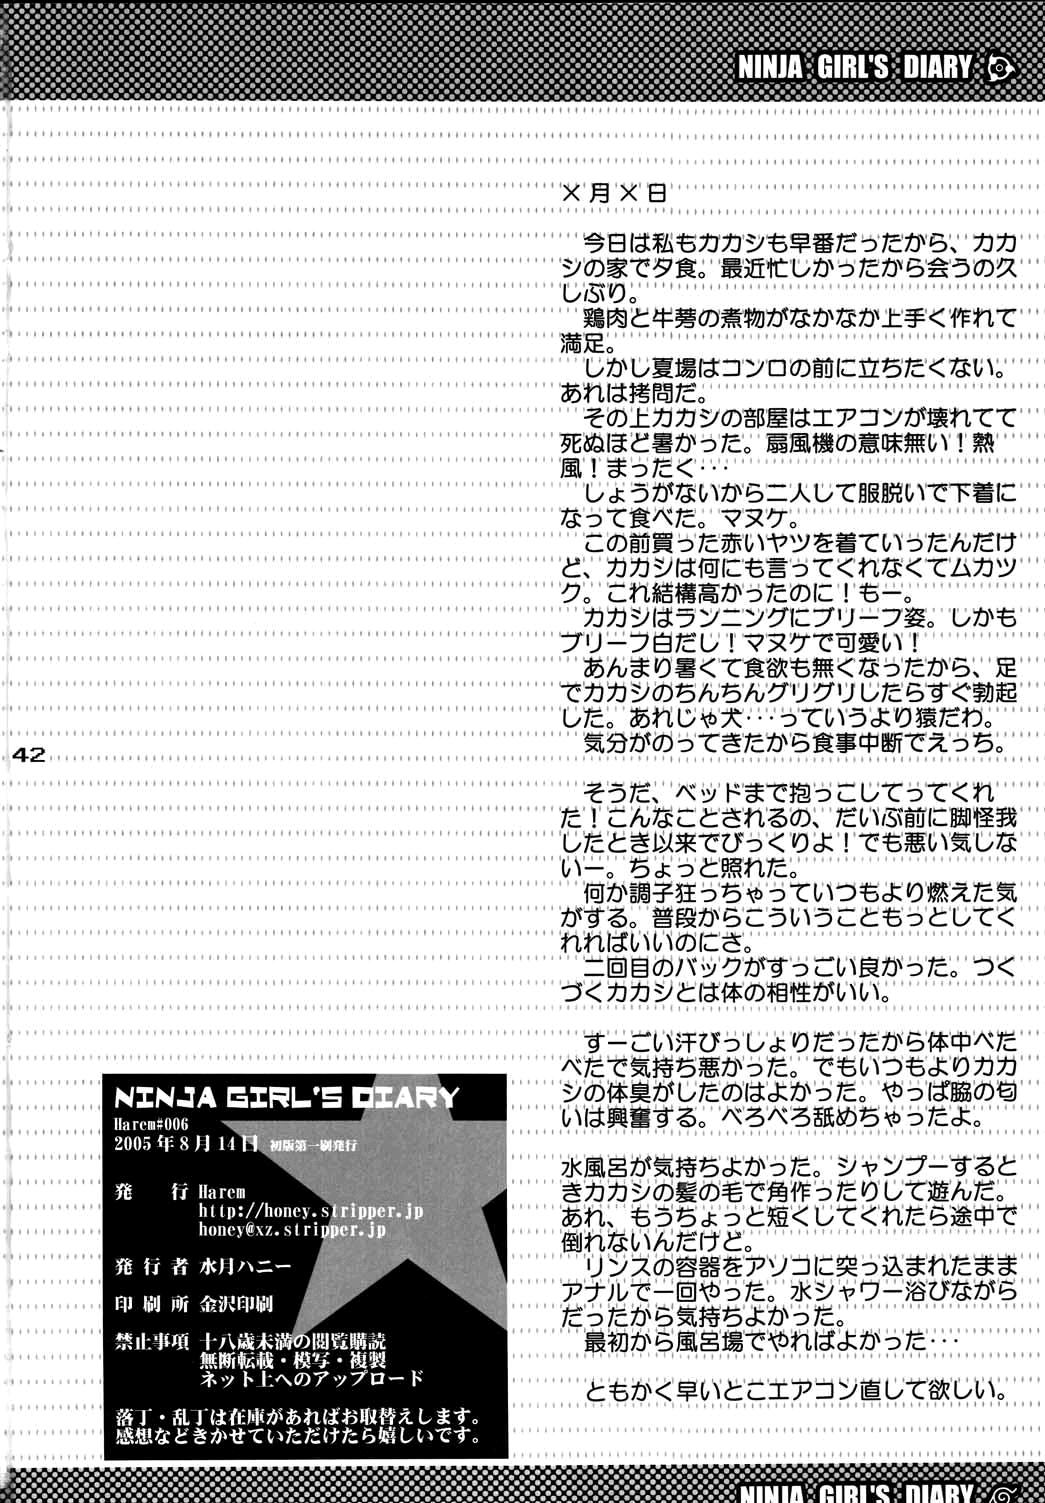 Ninja Girl's Diary 20